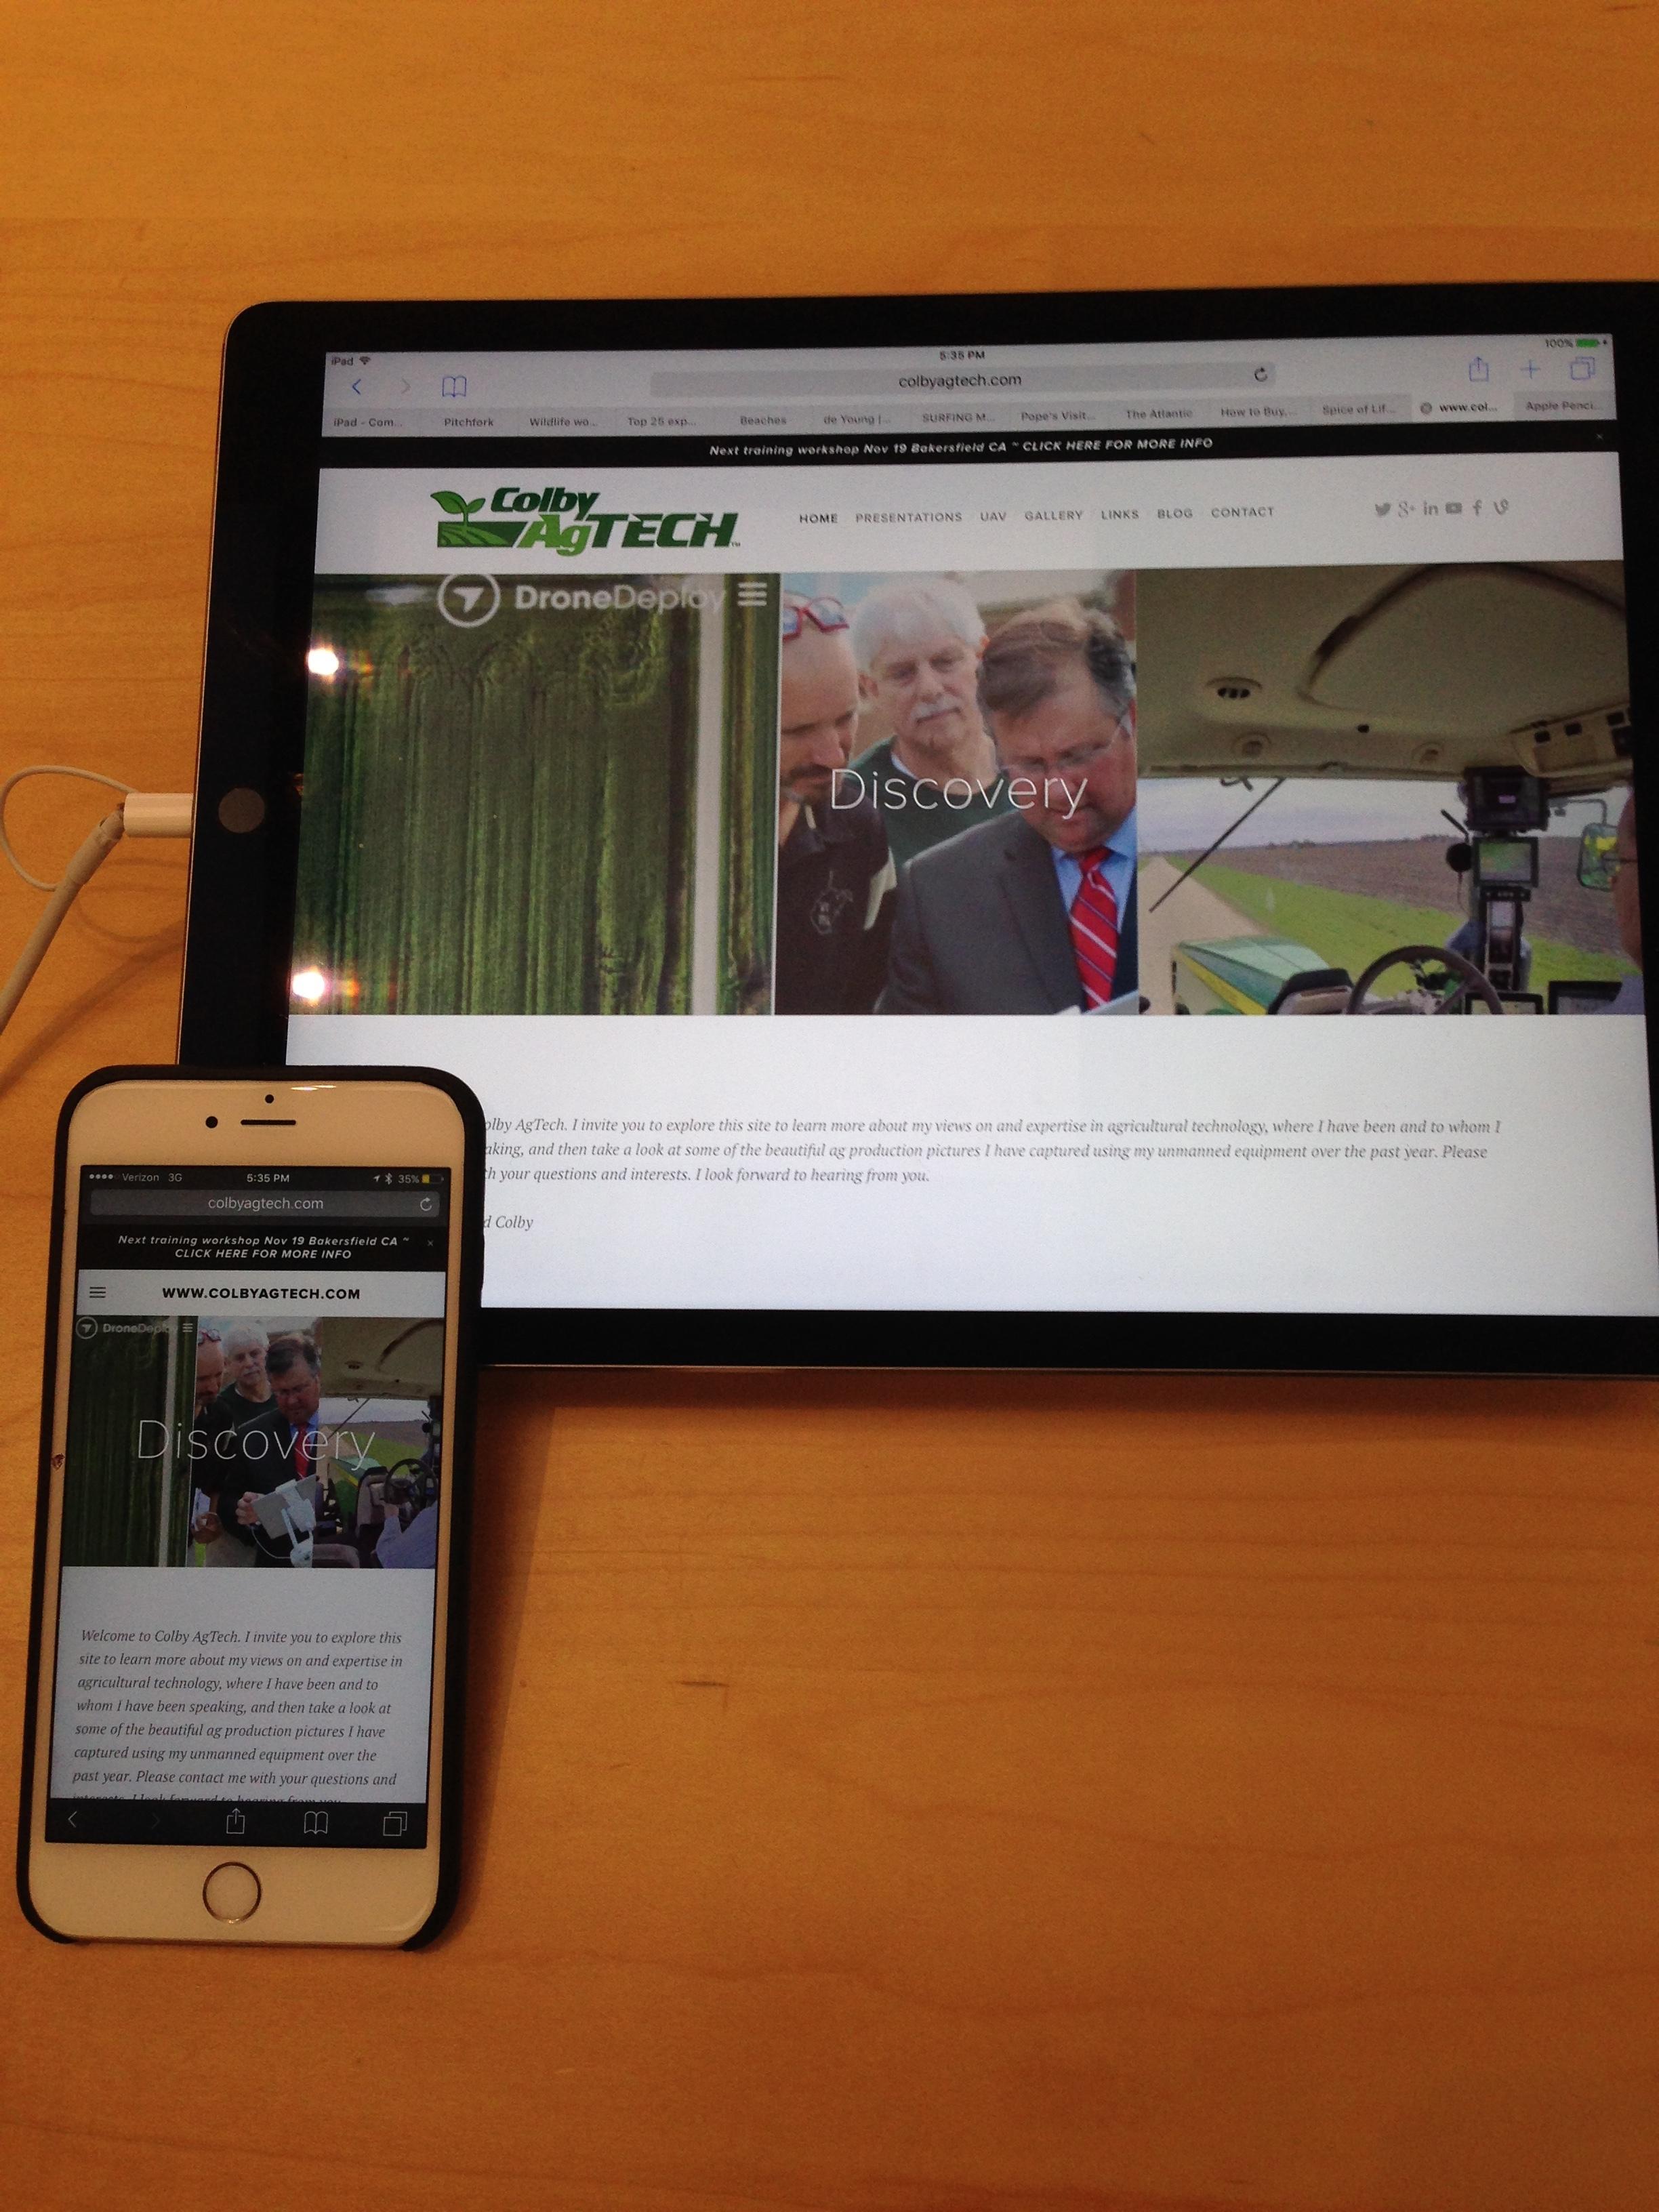 NEW iPad Pro is impressive site sitting next to my iPhone 6 Plus.